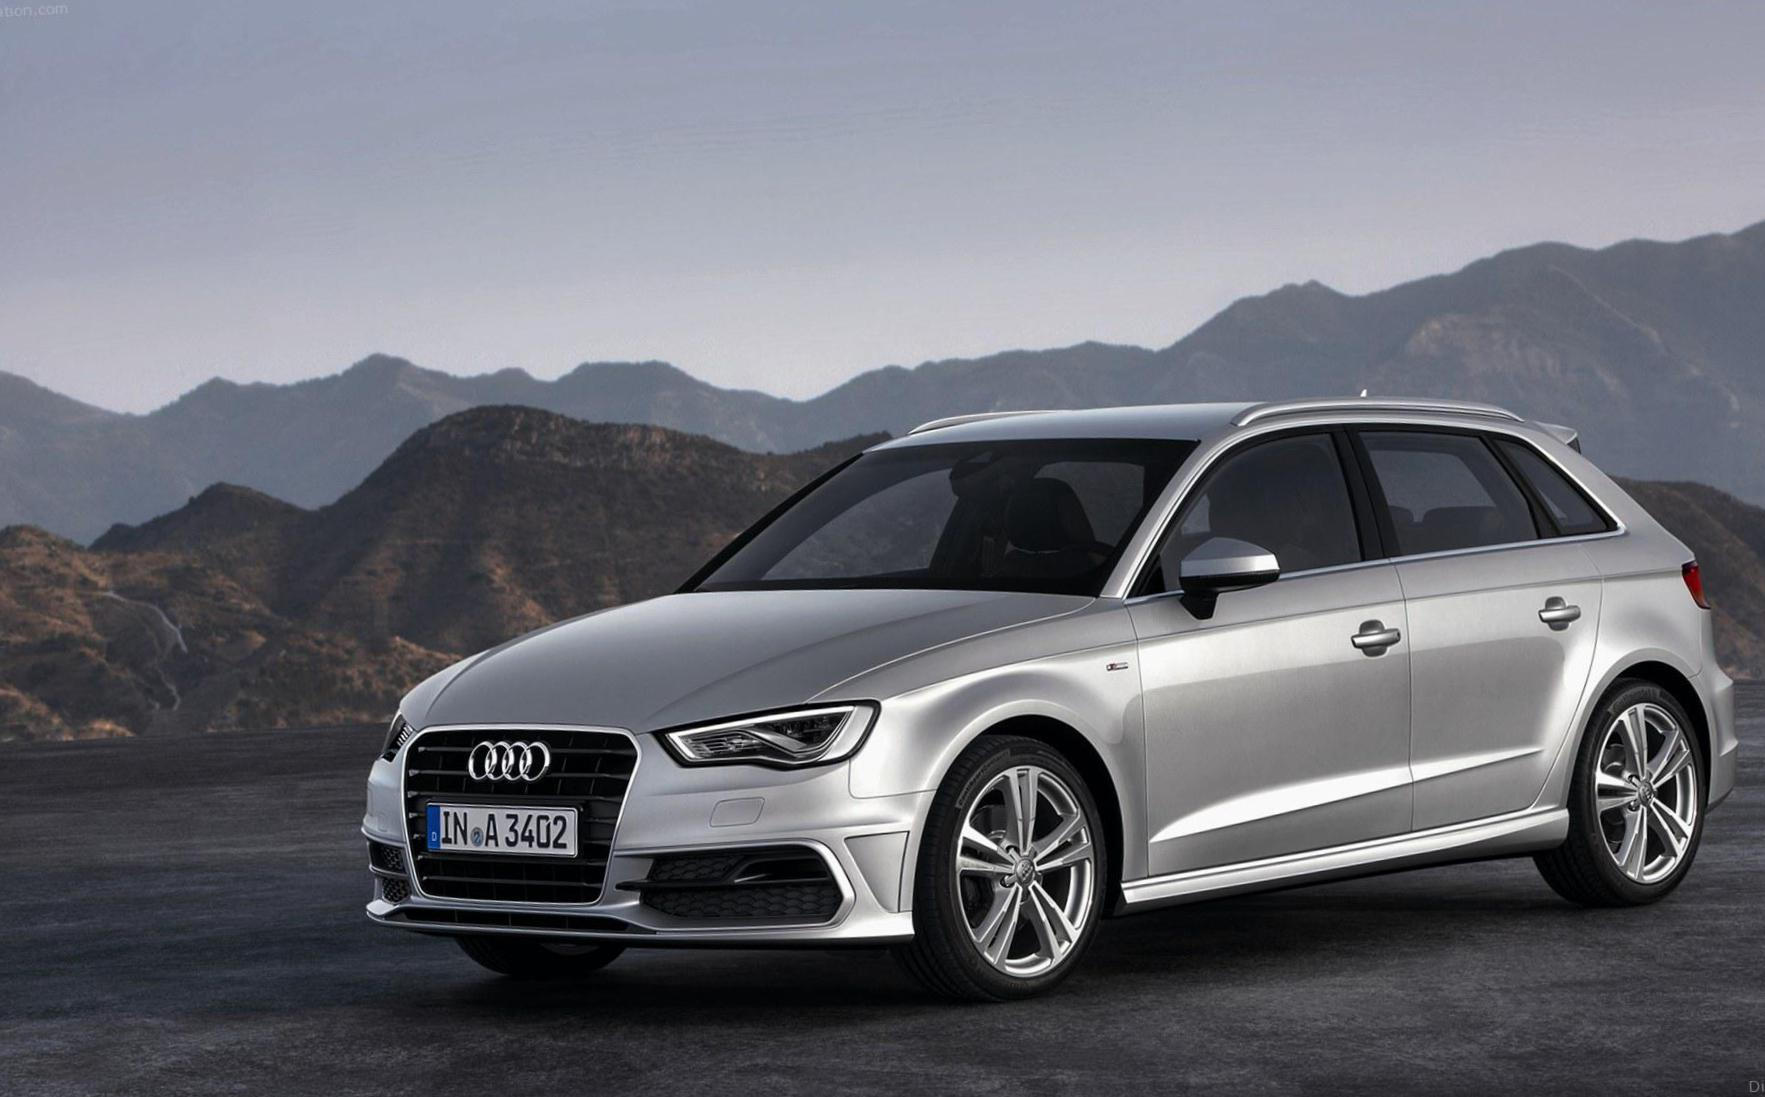 Audi A Sportback Photos And Specs Photo Audi A Sportback Tuning - Audi a3 wagon